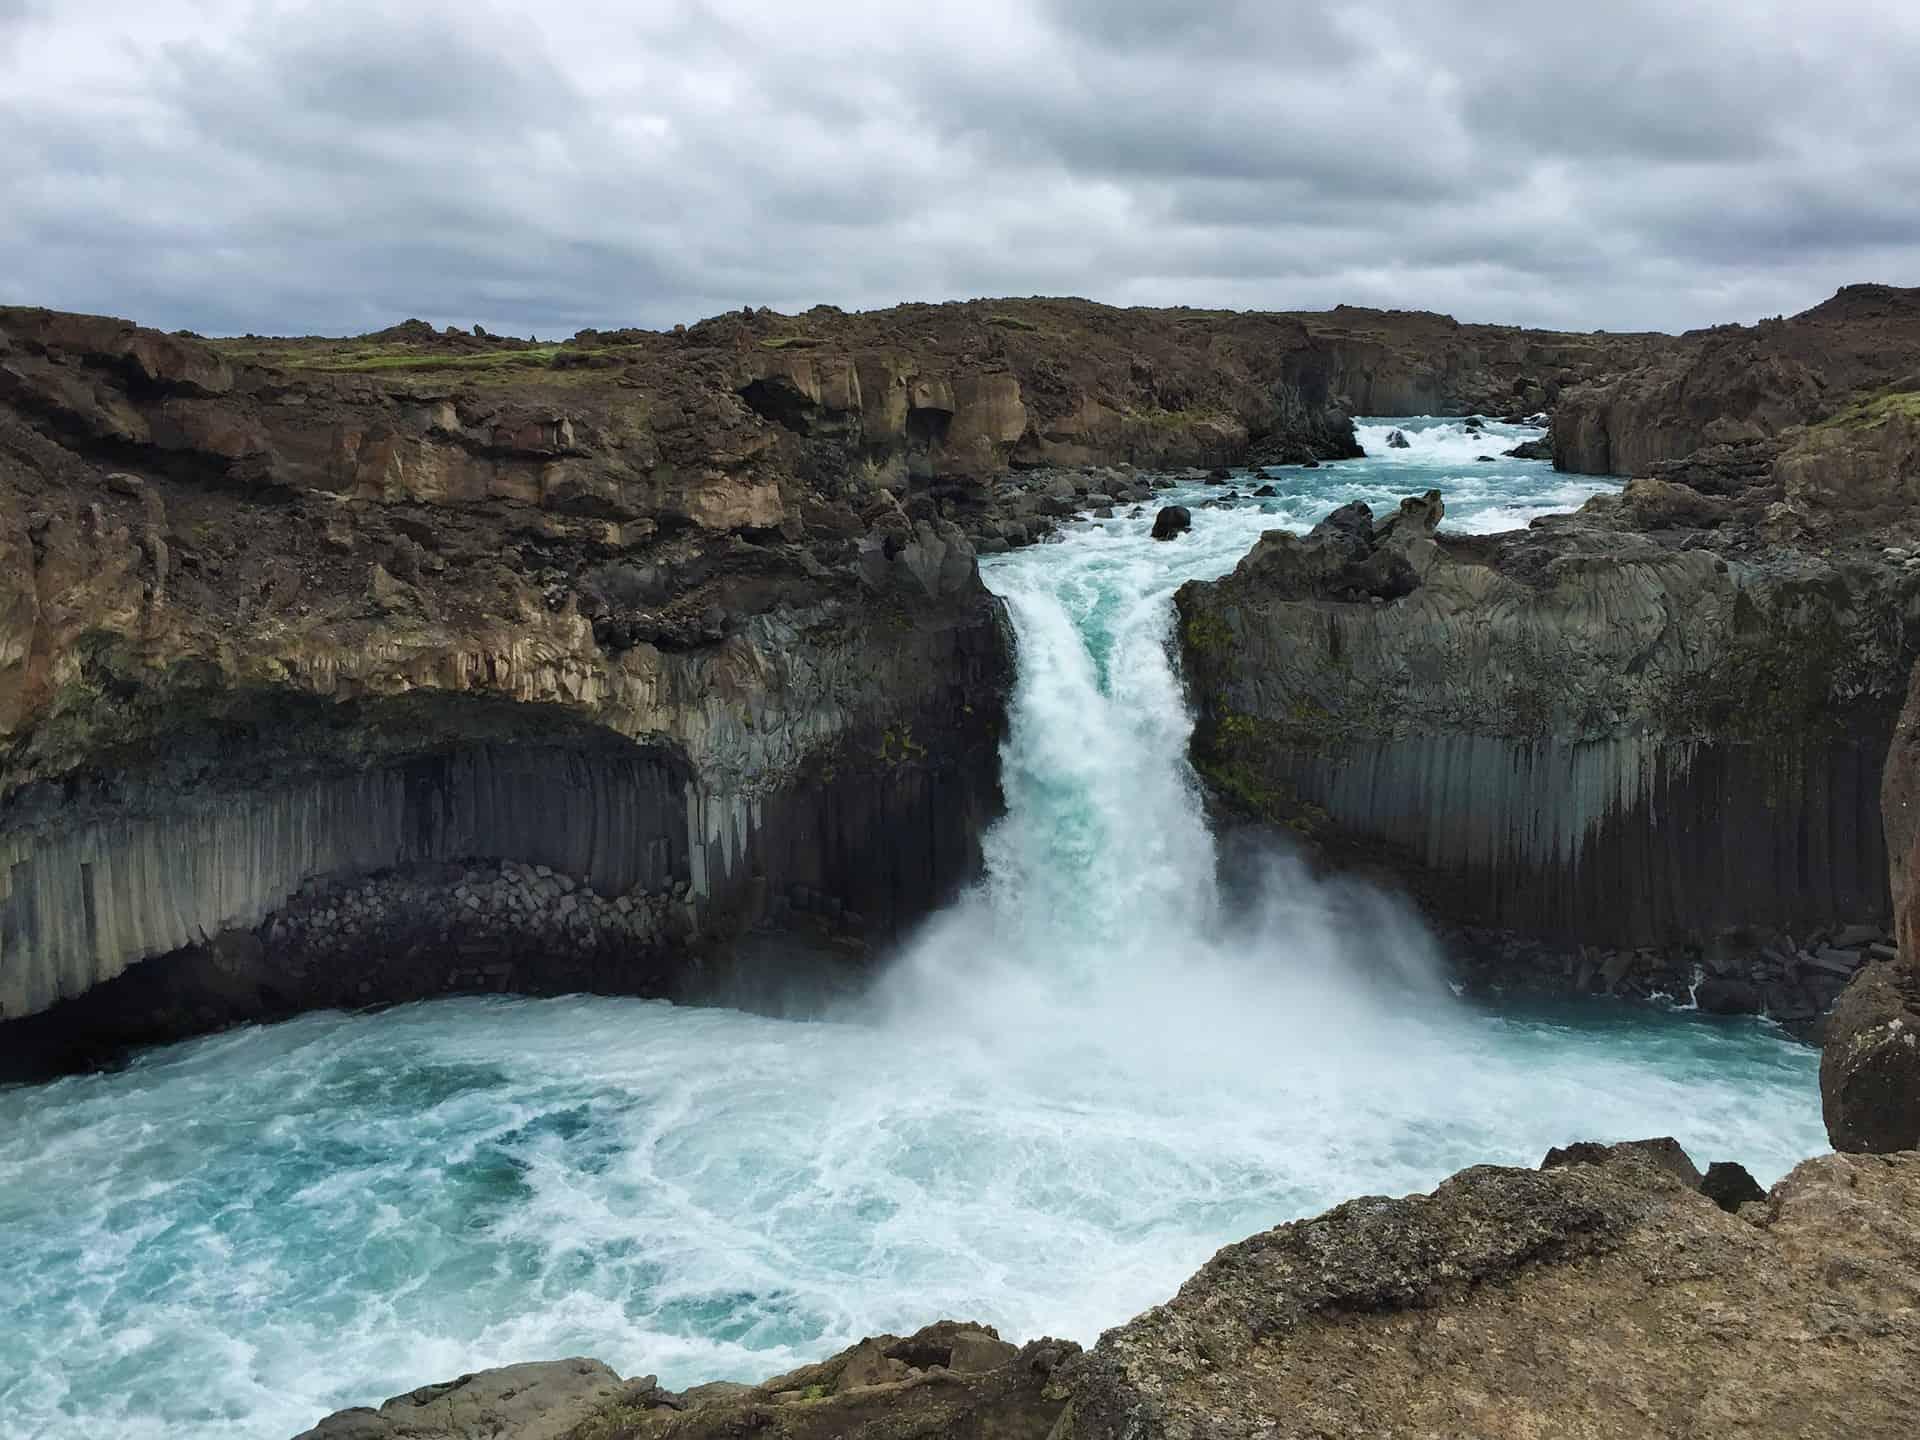 Waterfalls in Iceland - Aldeyjarfoss